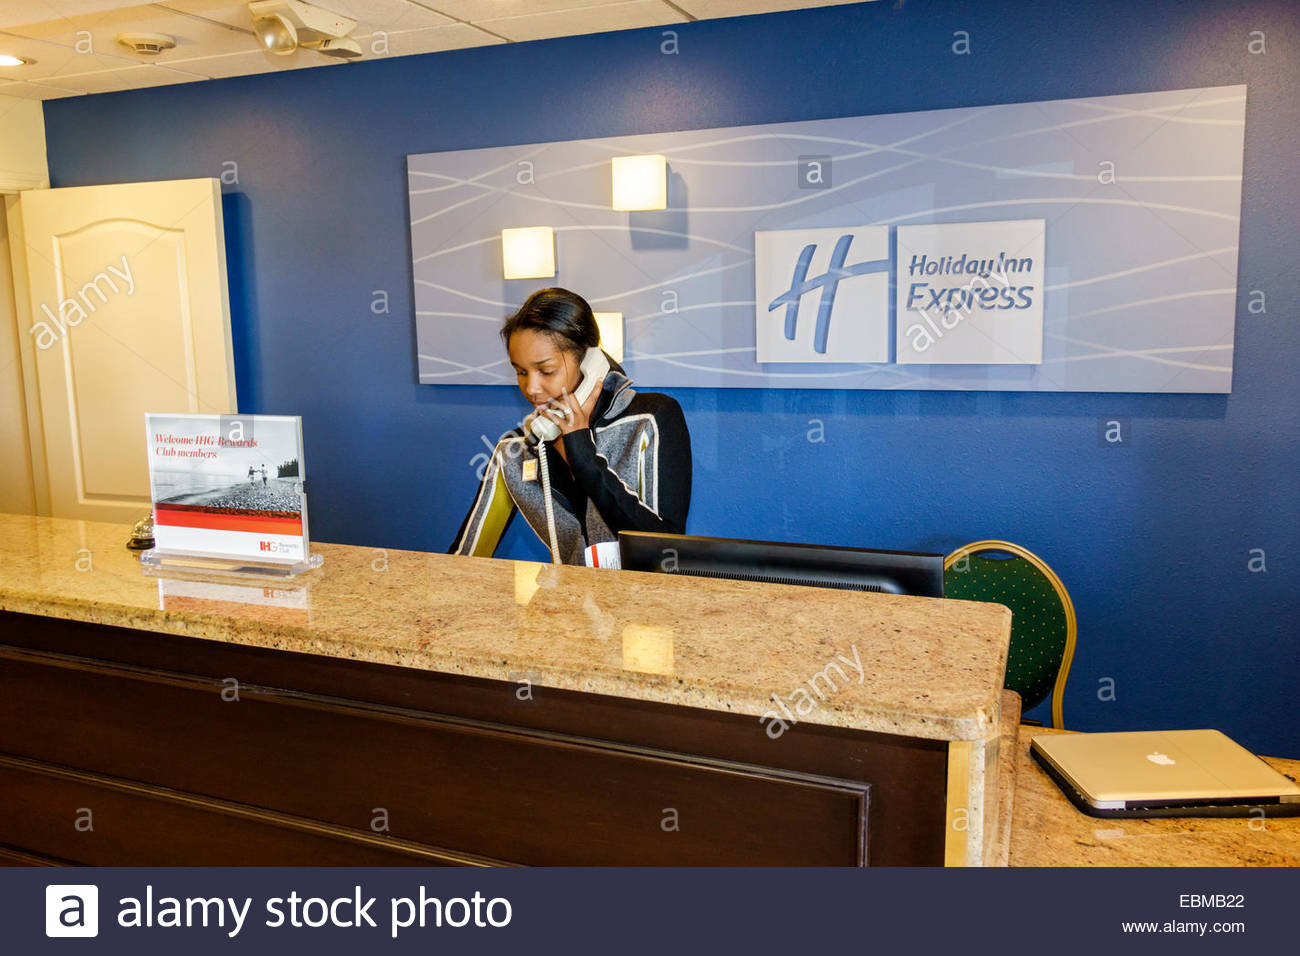 Delightful Clermont Florida Holiday Inn Express Motel Lobby Front Desk Reception Black  Woman Employee Job